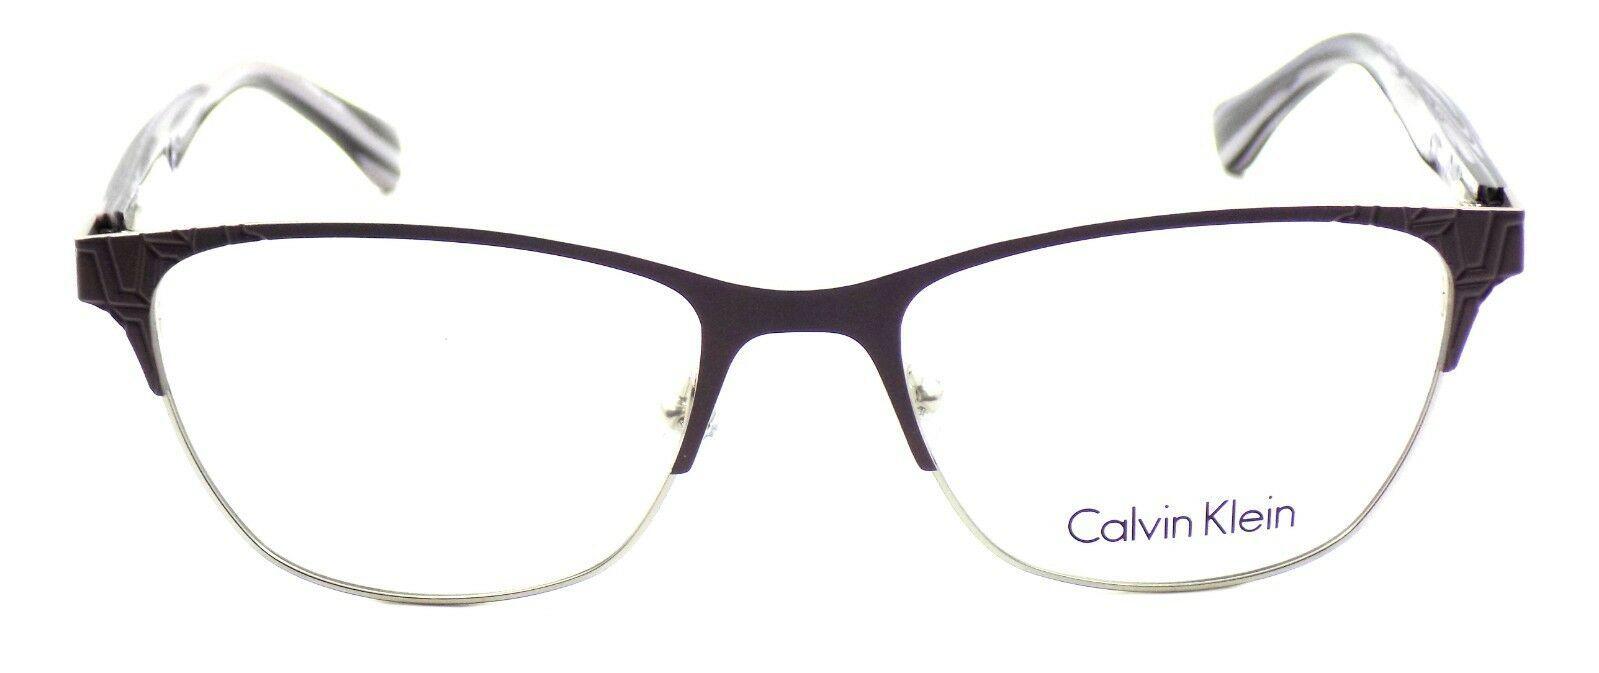 Calvin Klein CK5413 531 Women's Eyeglasses Frames Mauve 52-17-135 + CASE